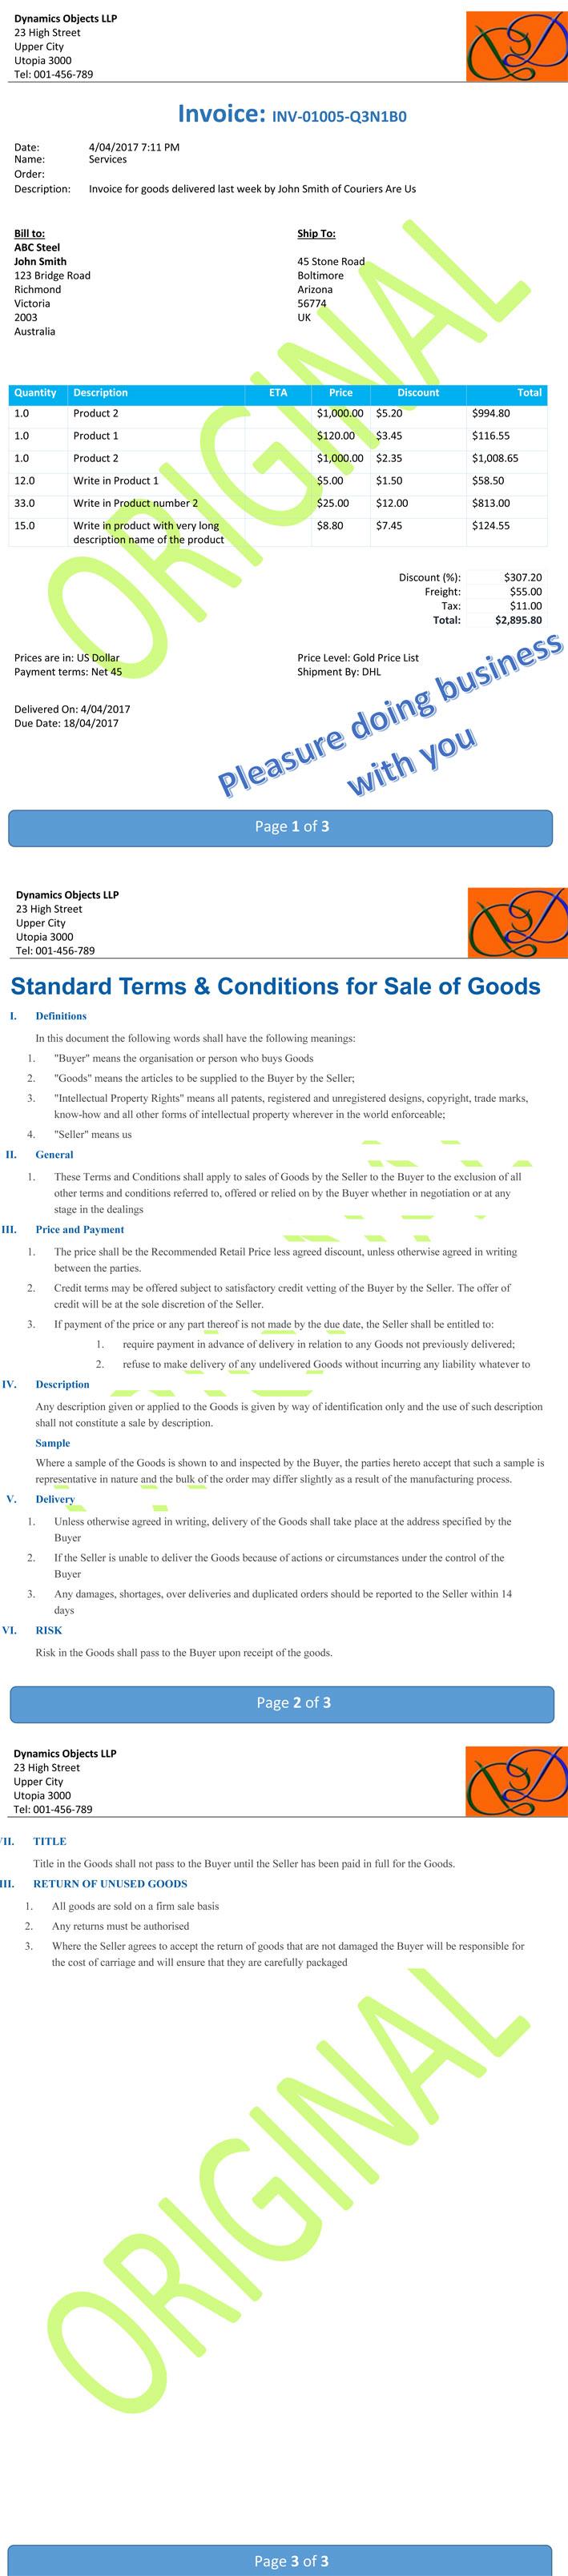 invoice 3 pages 1 Dynamics PDF Docs> Just Got Better !